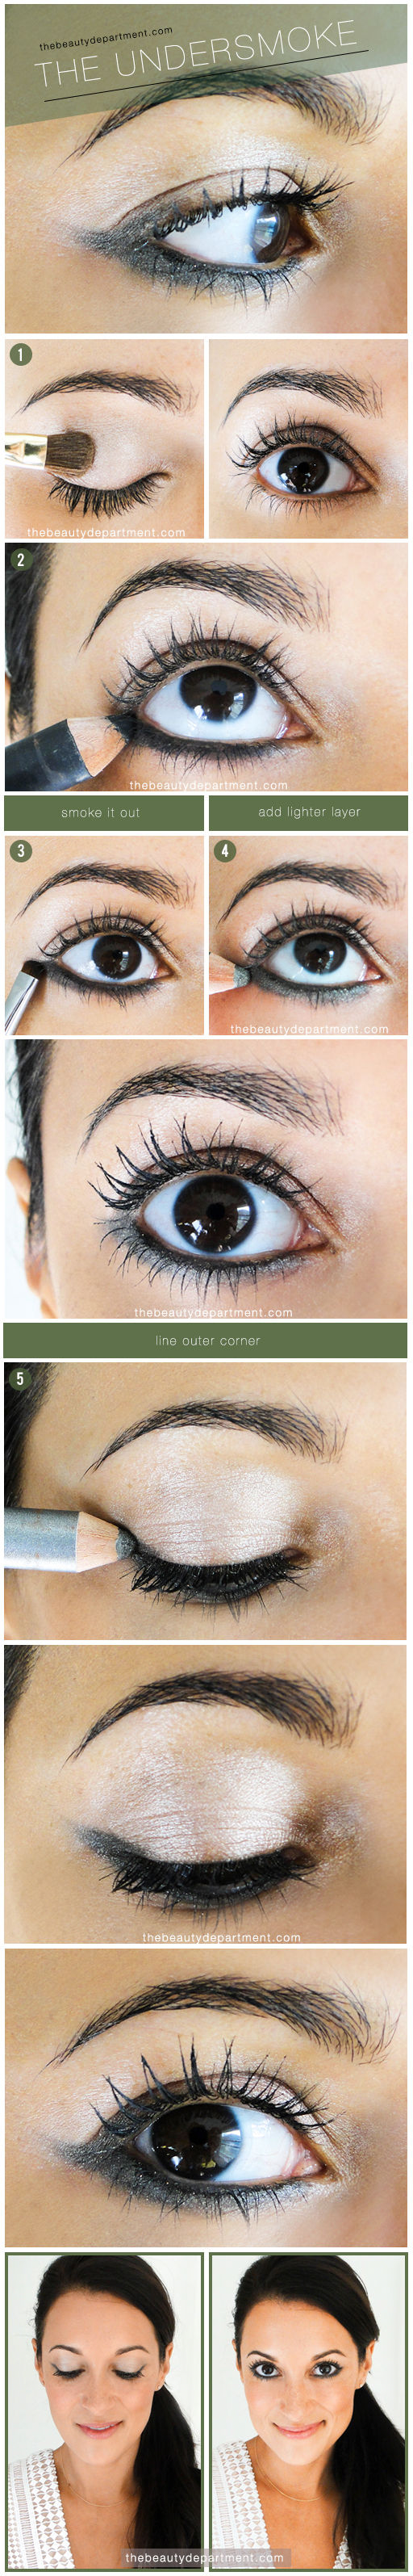 Tutorial maquillaje ojos ahumado párpado inferior